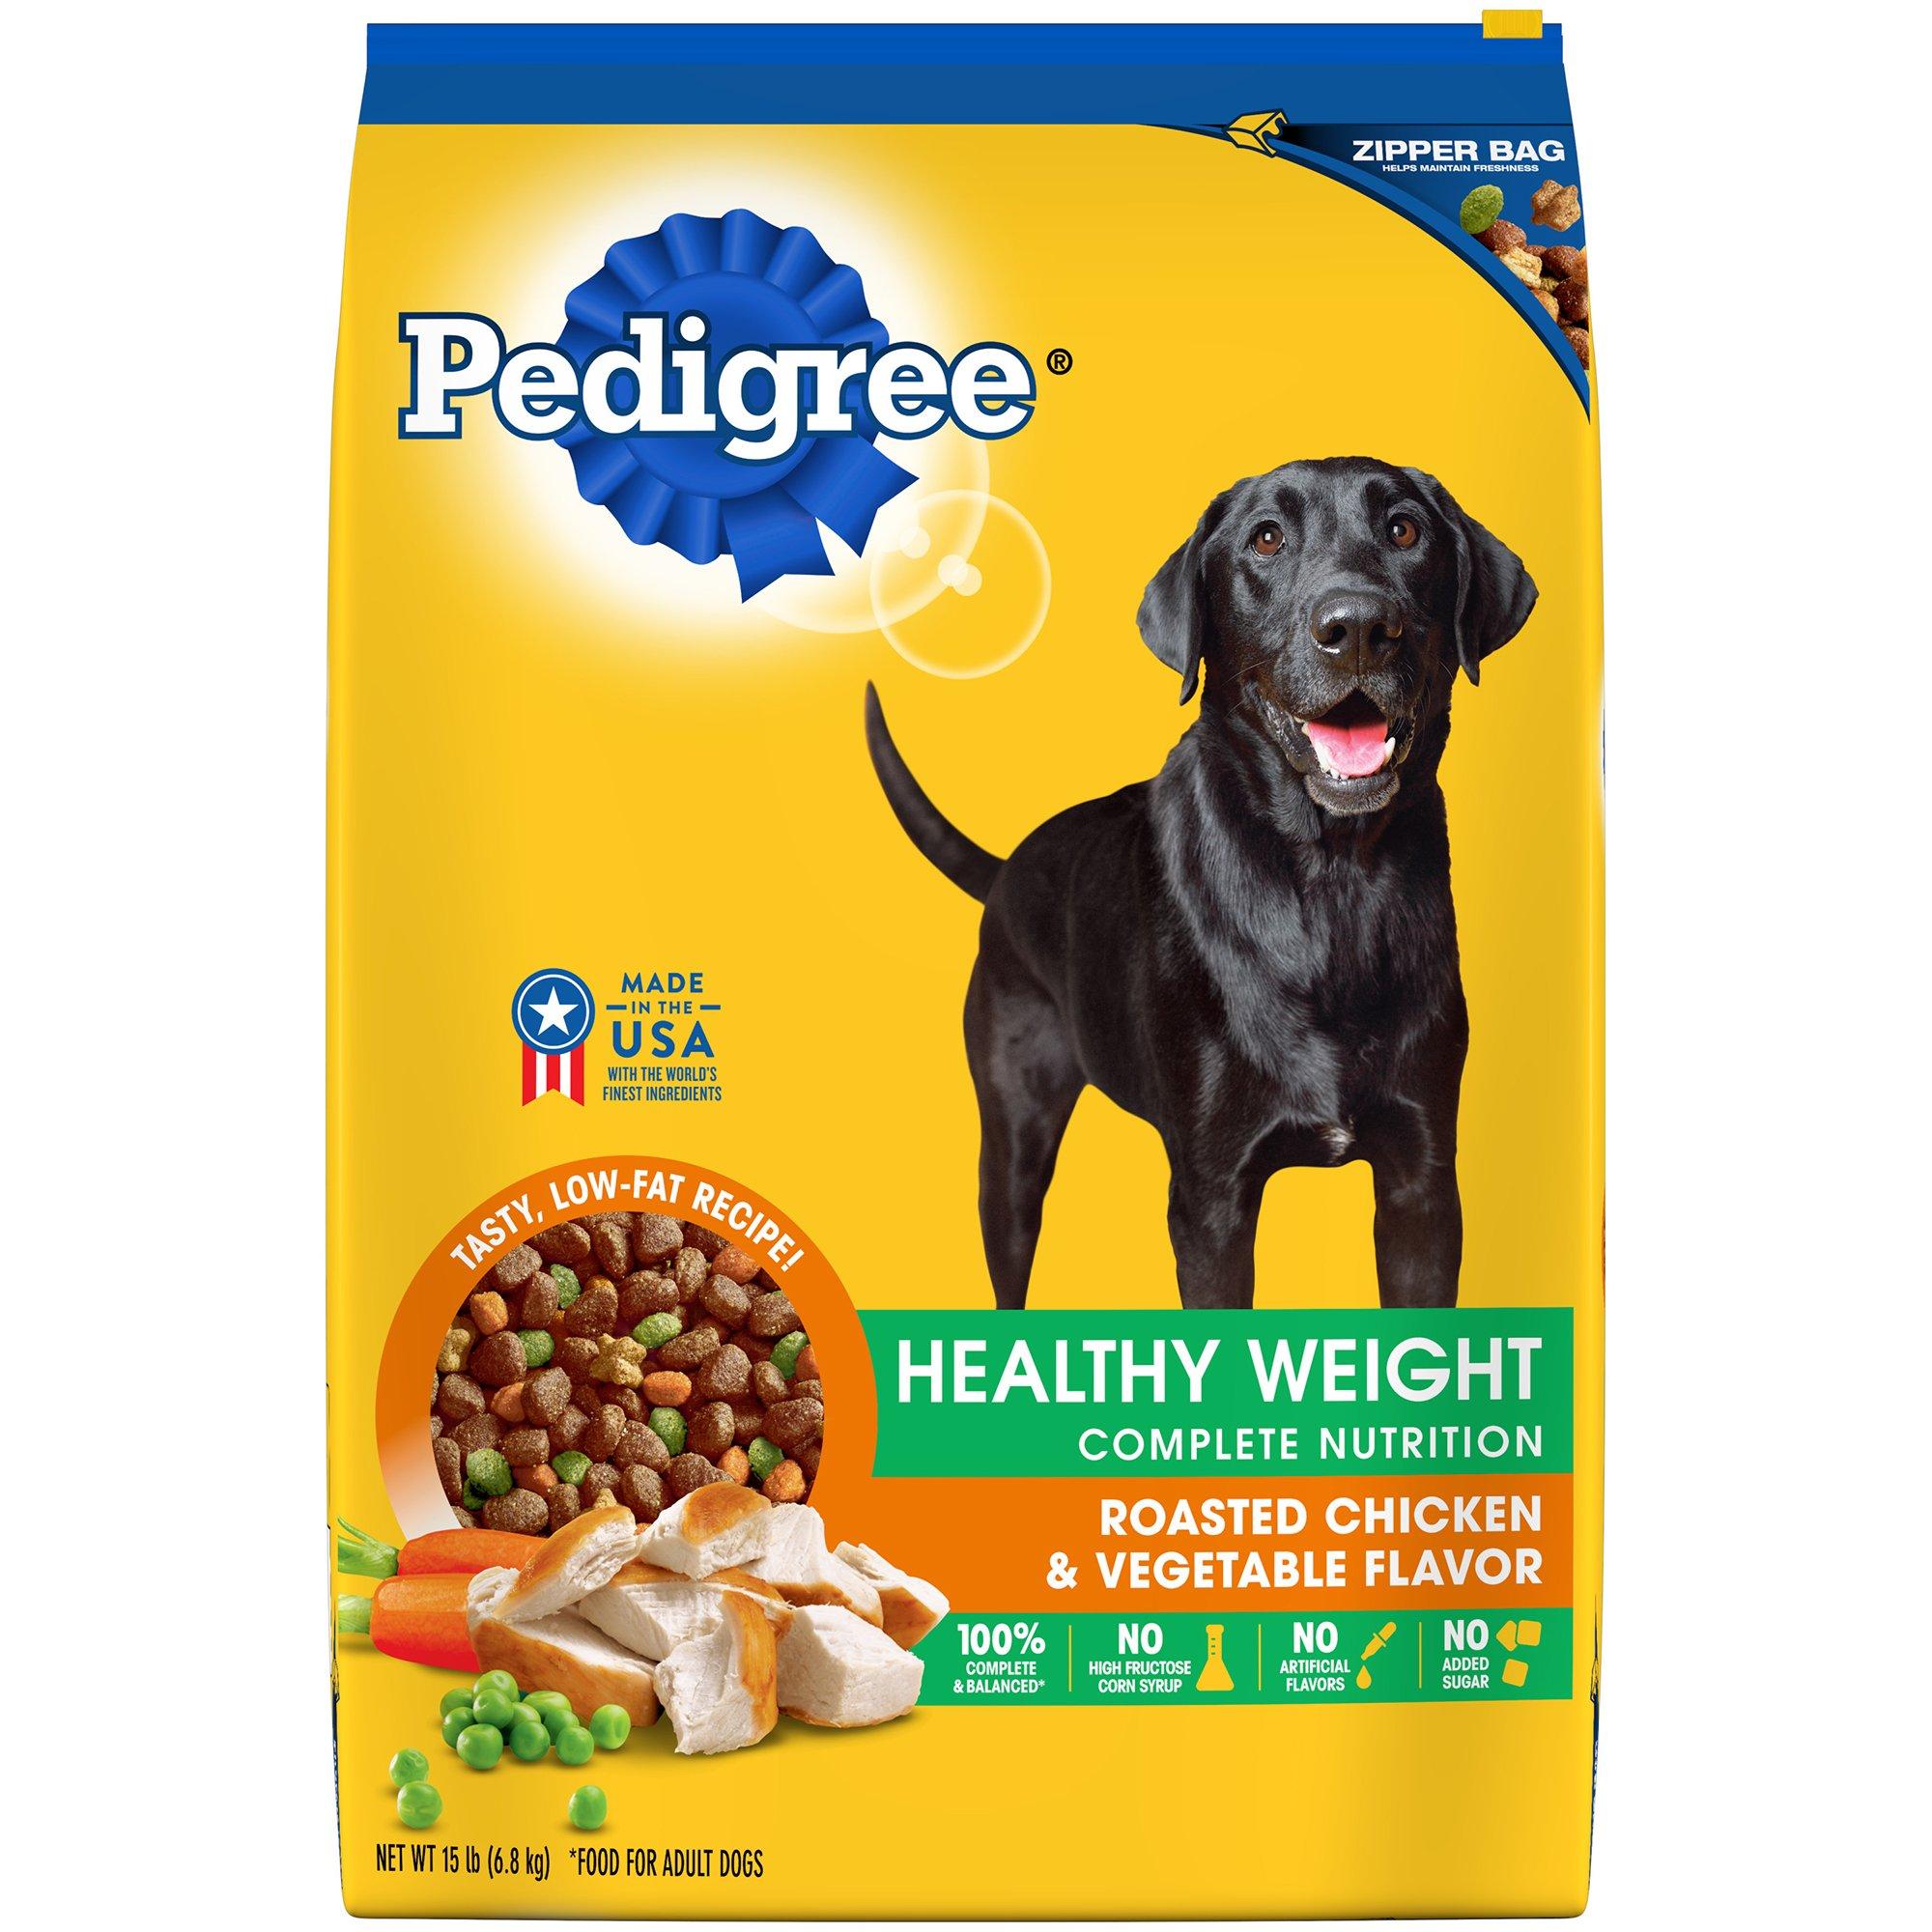 Pedigree Healthy Weight Adult Dry Dog Food Roasted Chicken & Vegetable Flavor, 15 lb. Bag